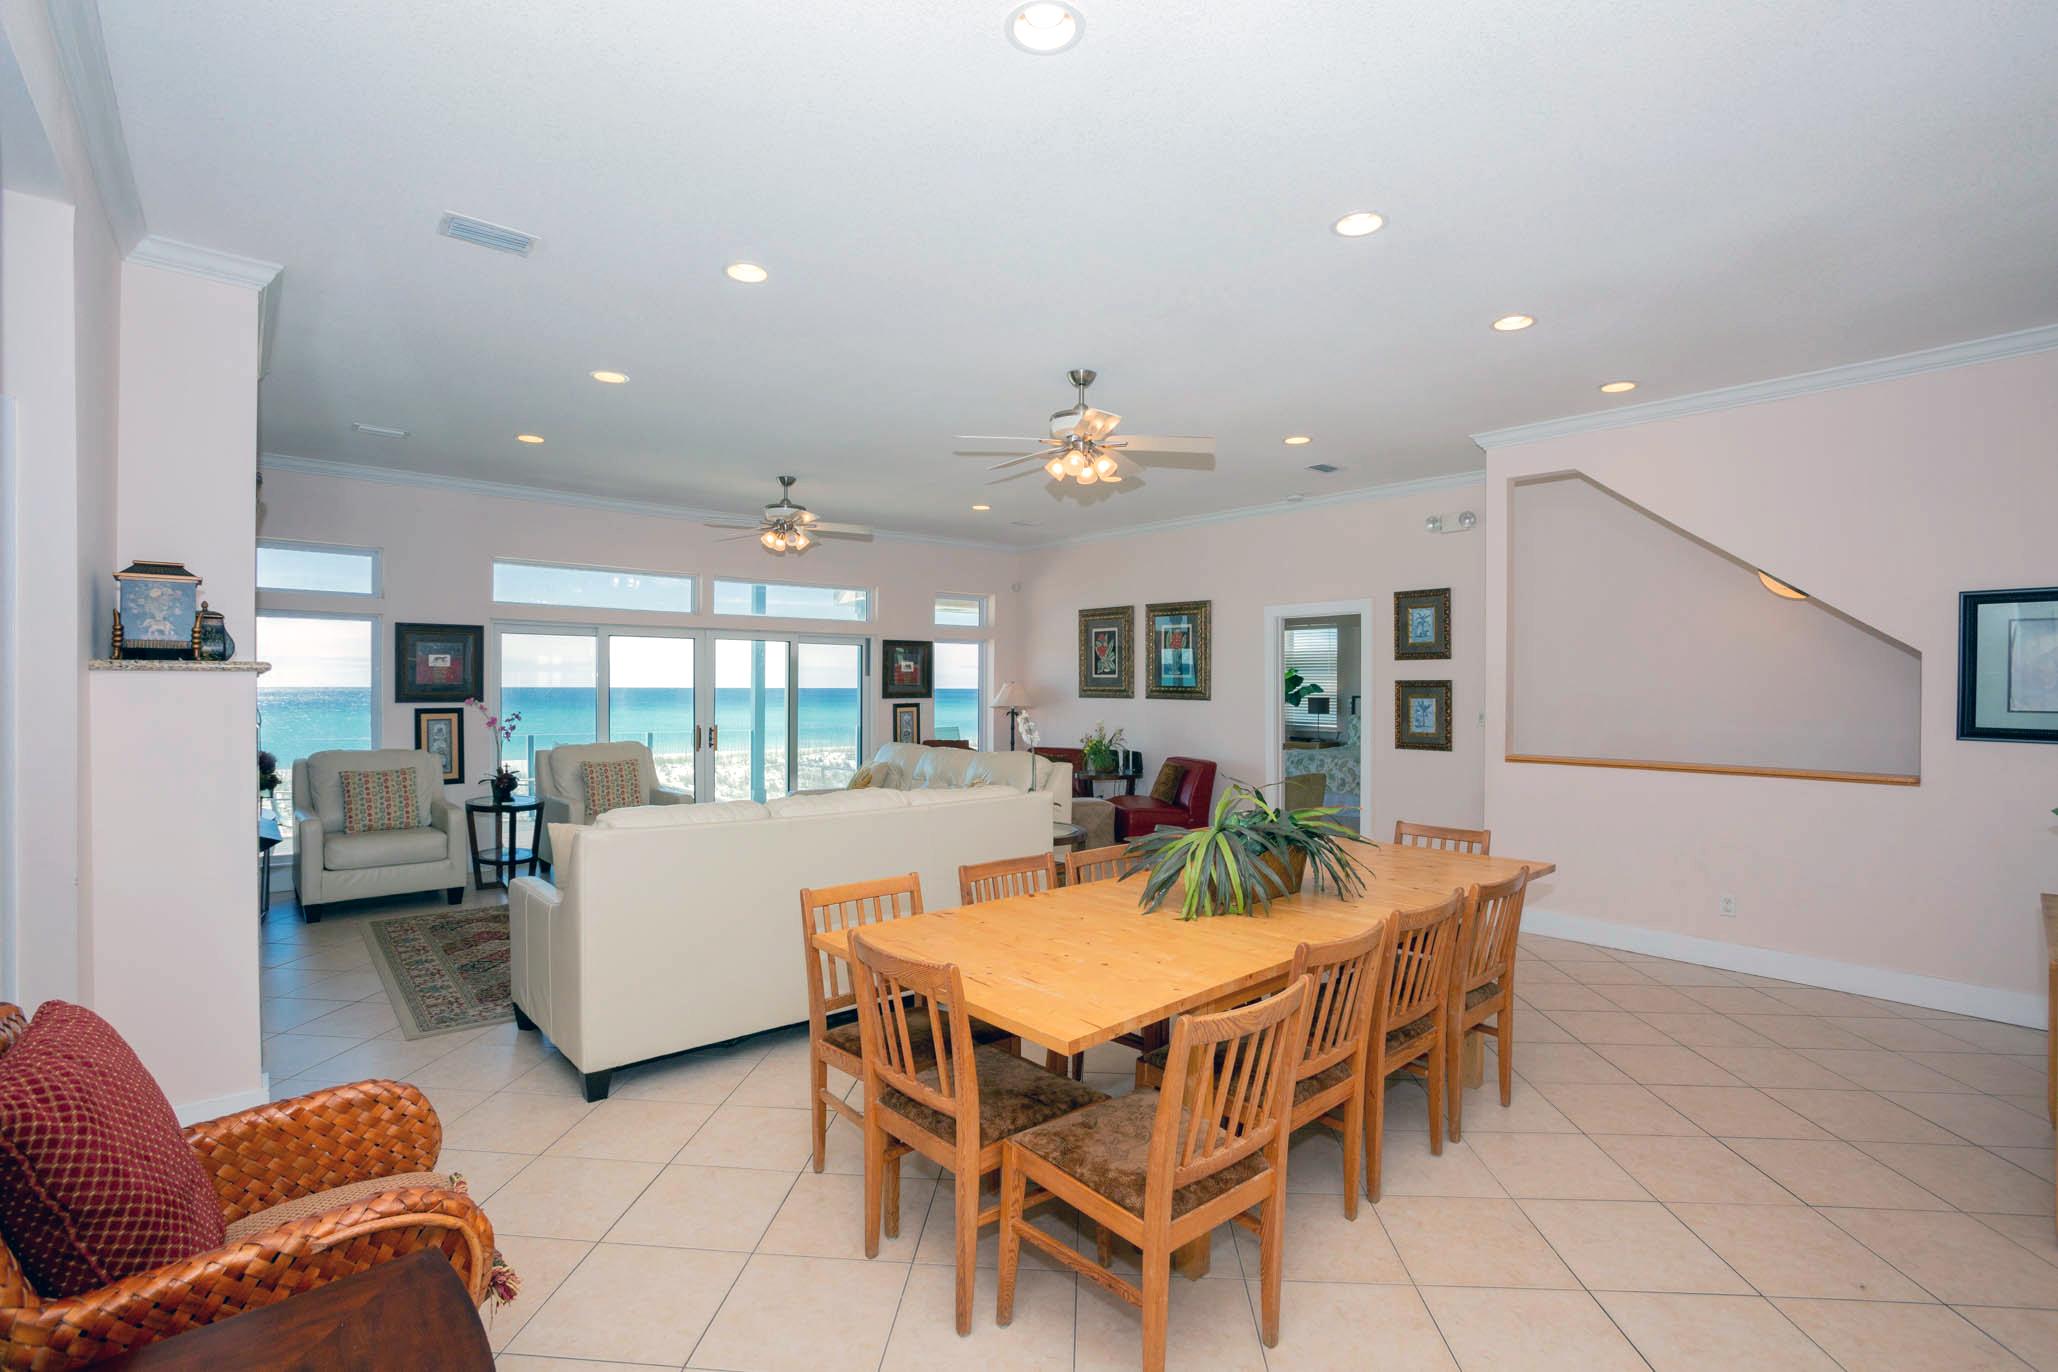 Ariola 1214 House/Cottage rental in Luxury Homes in Pensacola Beach Florida - #13